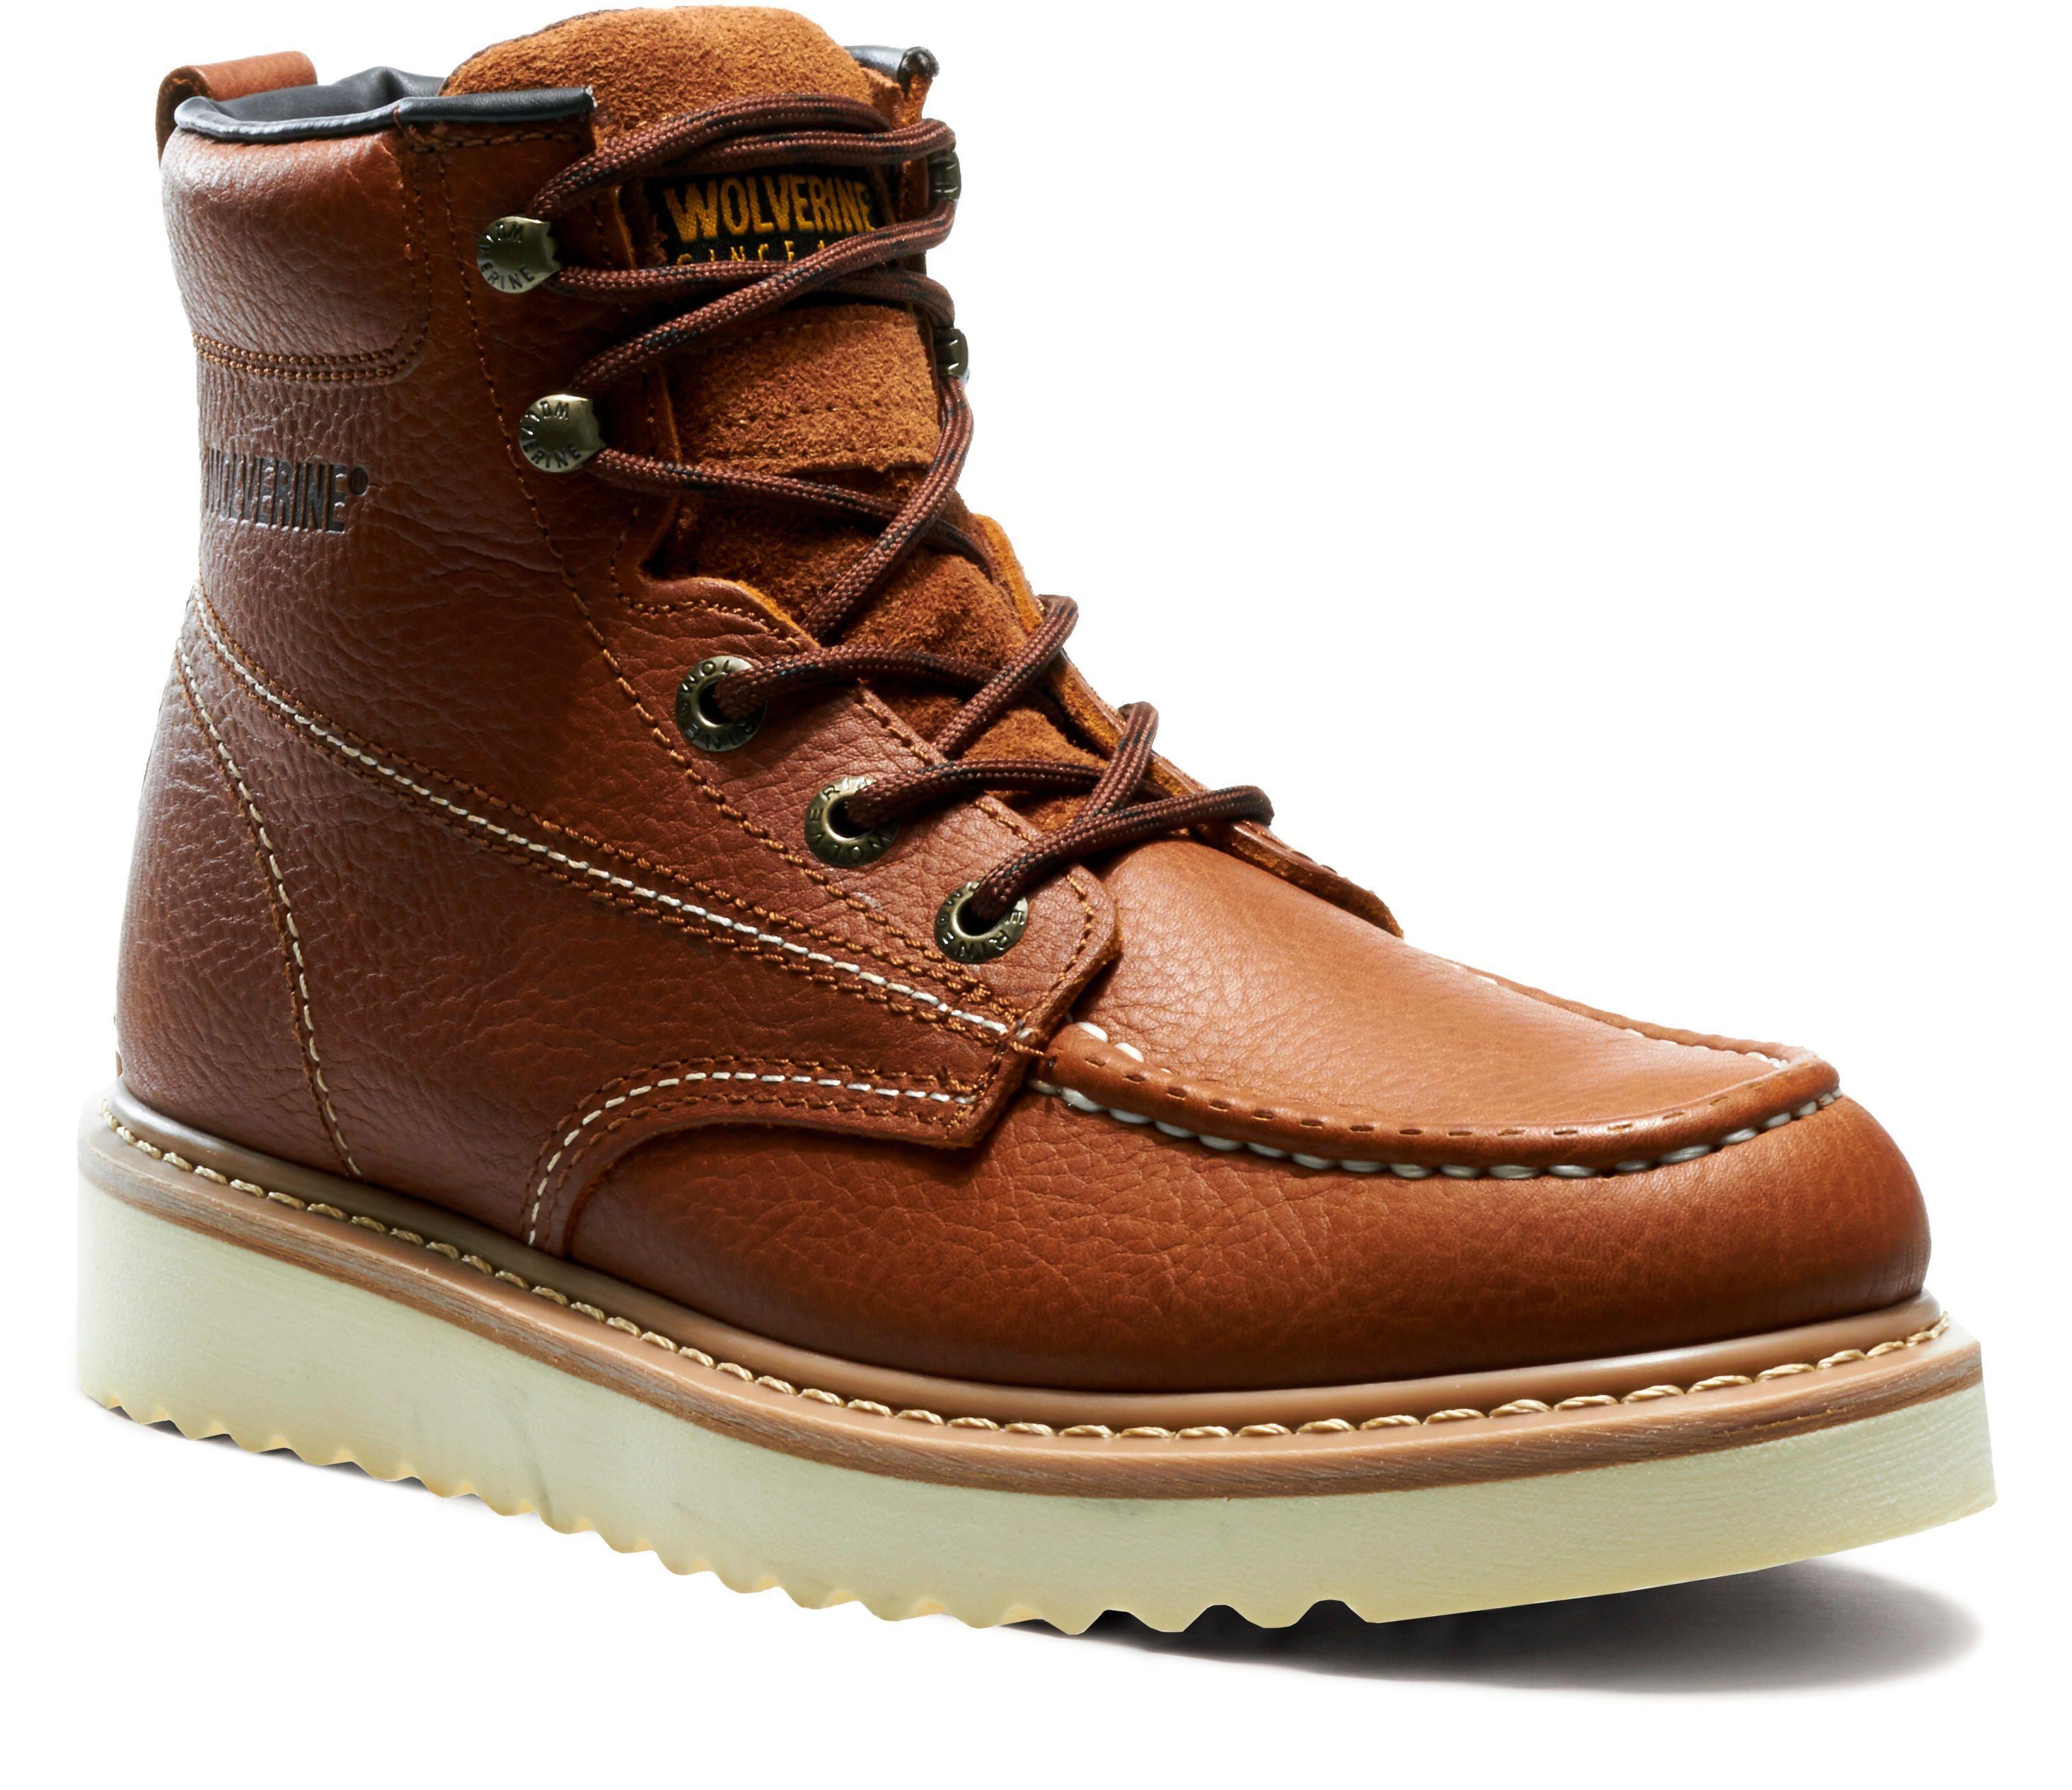 1beecf44feb 10 Best Work Boots 2019 | Steel Toe Boots